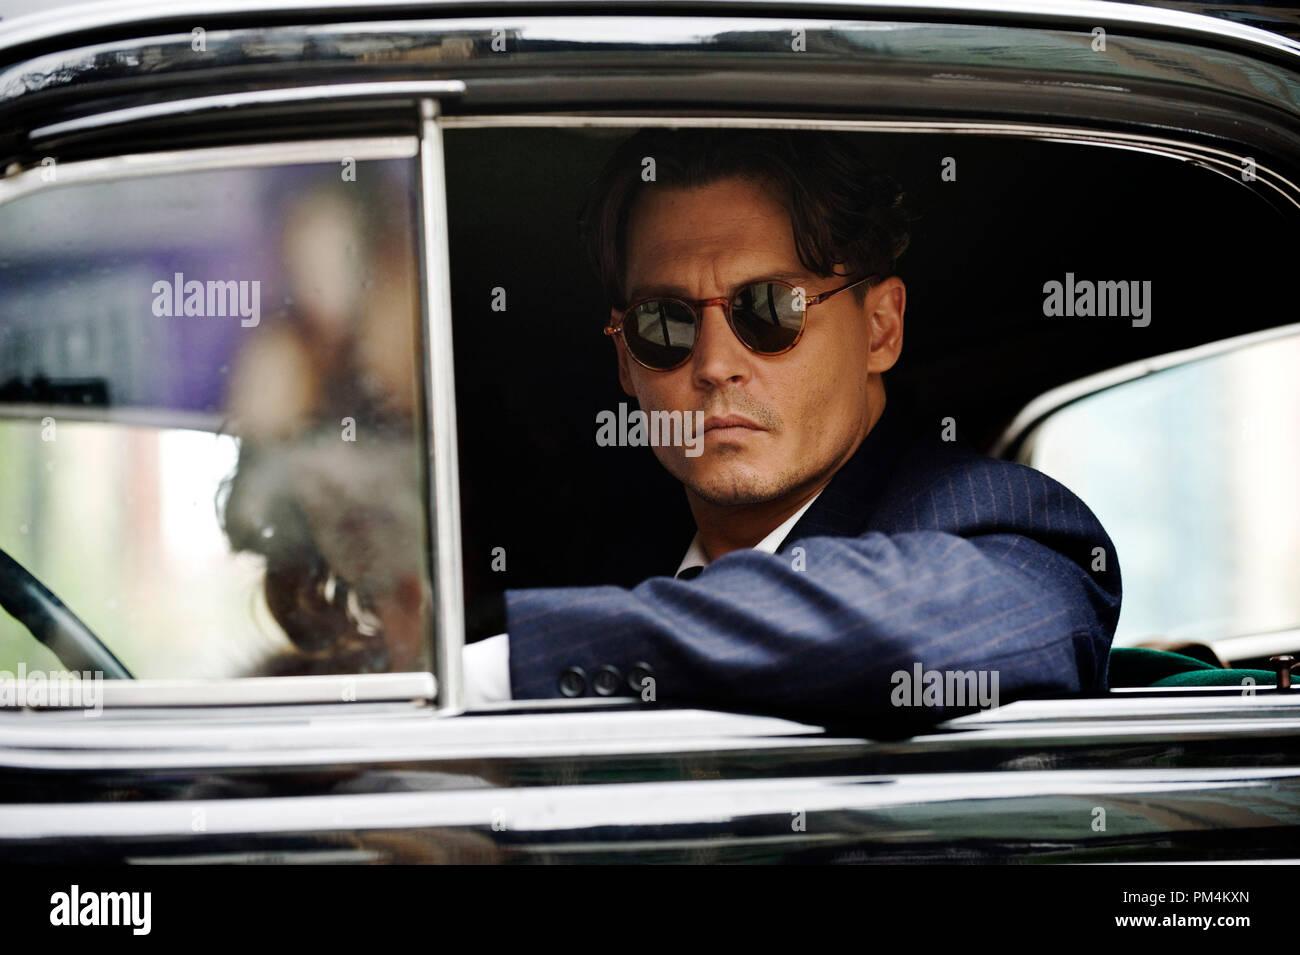 Public Enemies Johnny Depp - Stock Image